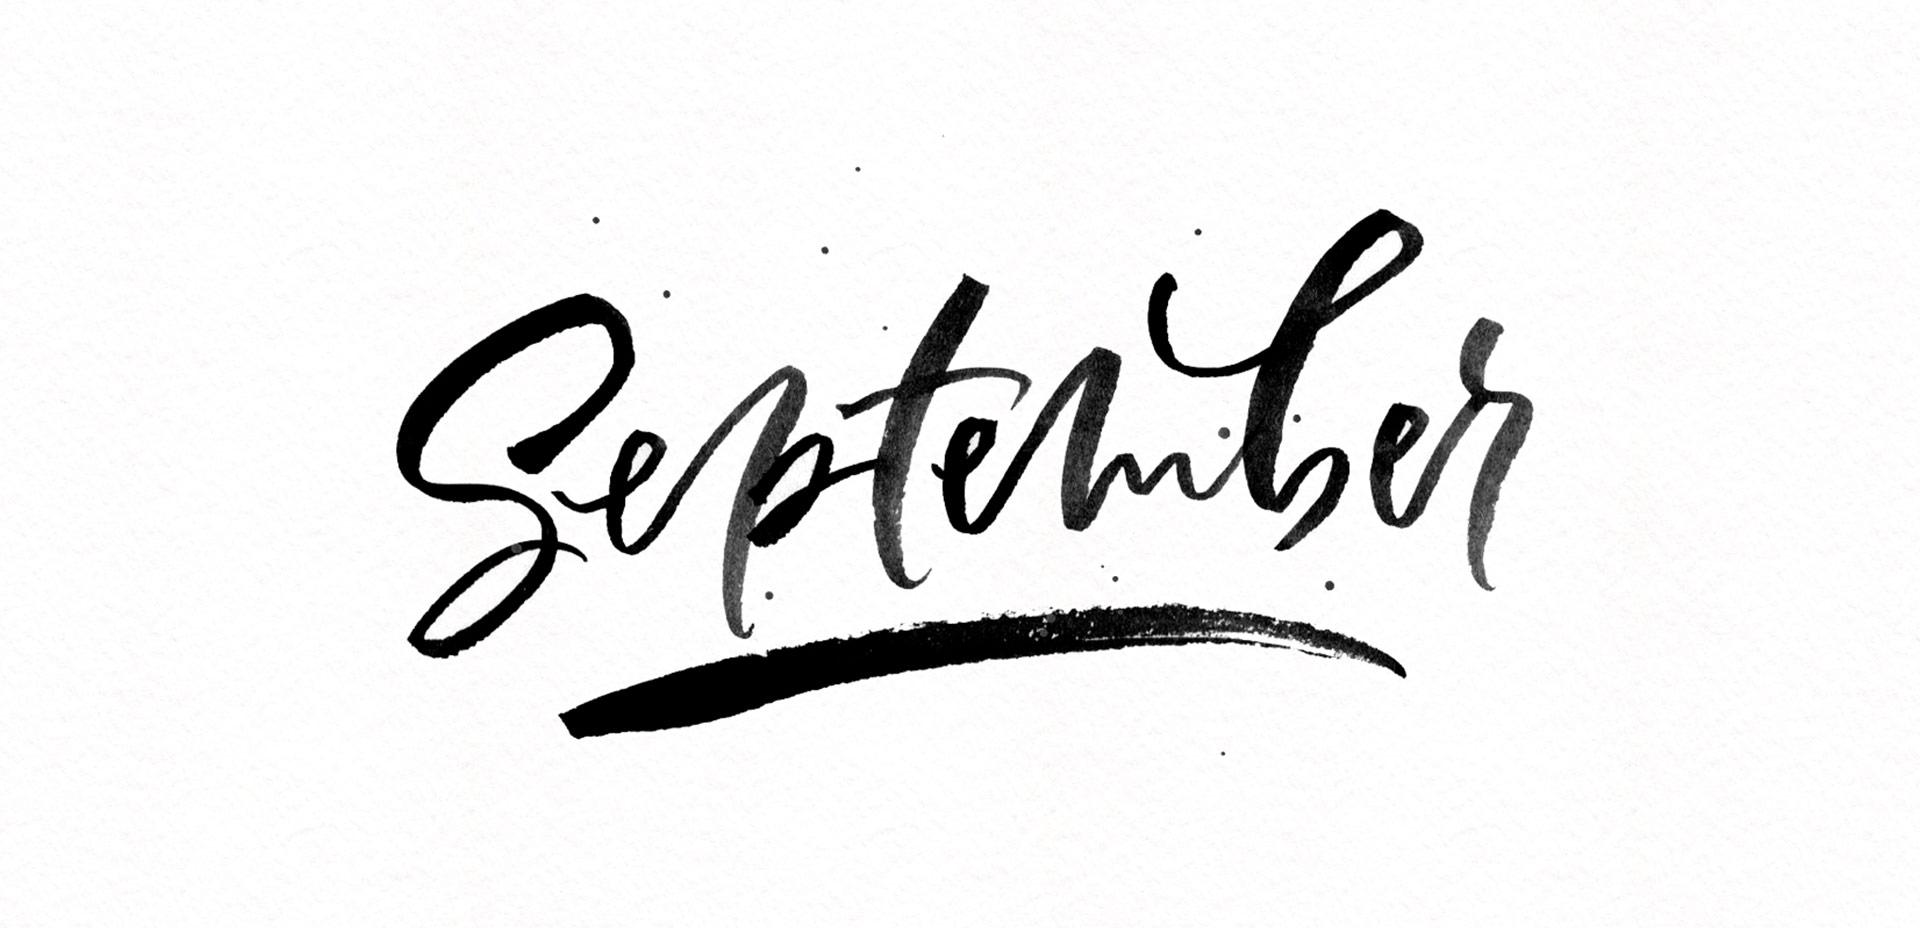 Glam Fall Background Wallpaper Freebie September 2017 Desktop Wallpapers Every Tuesday